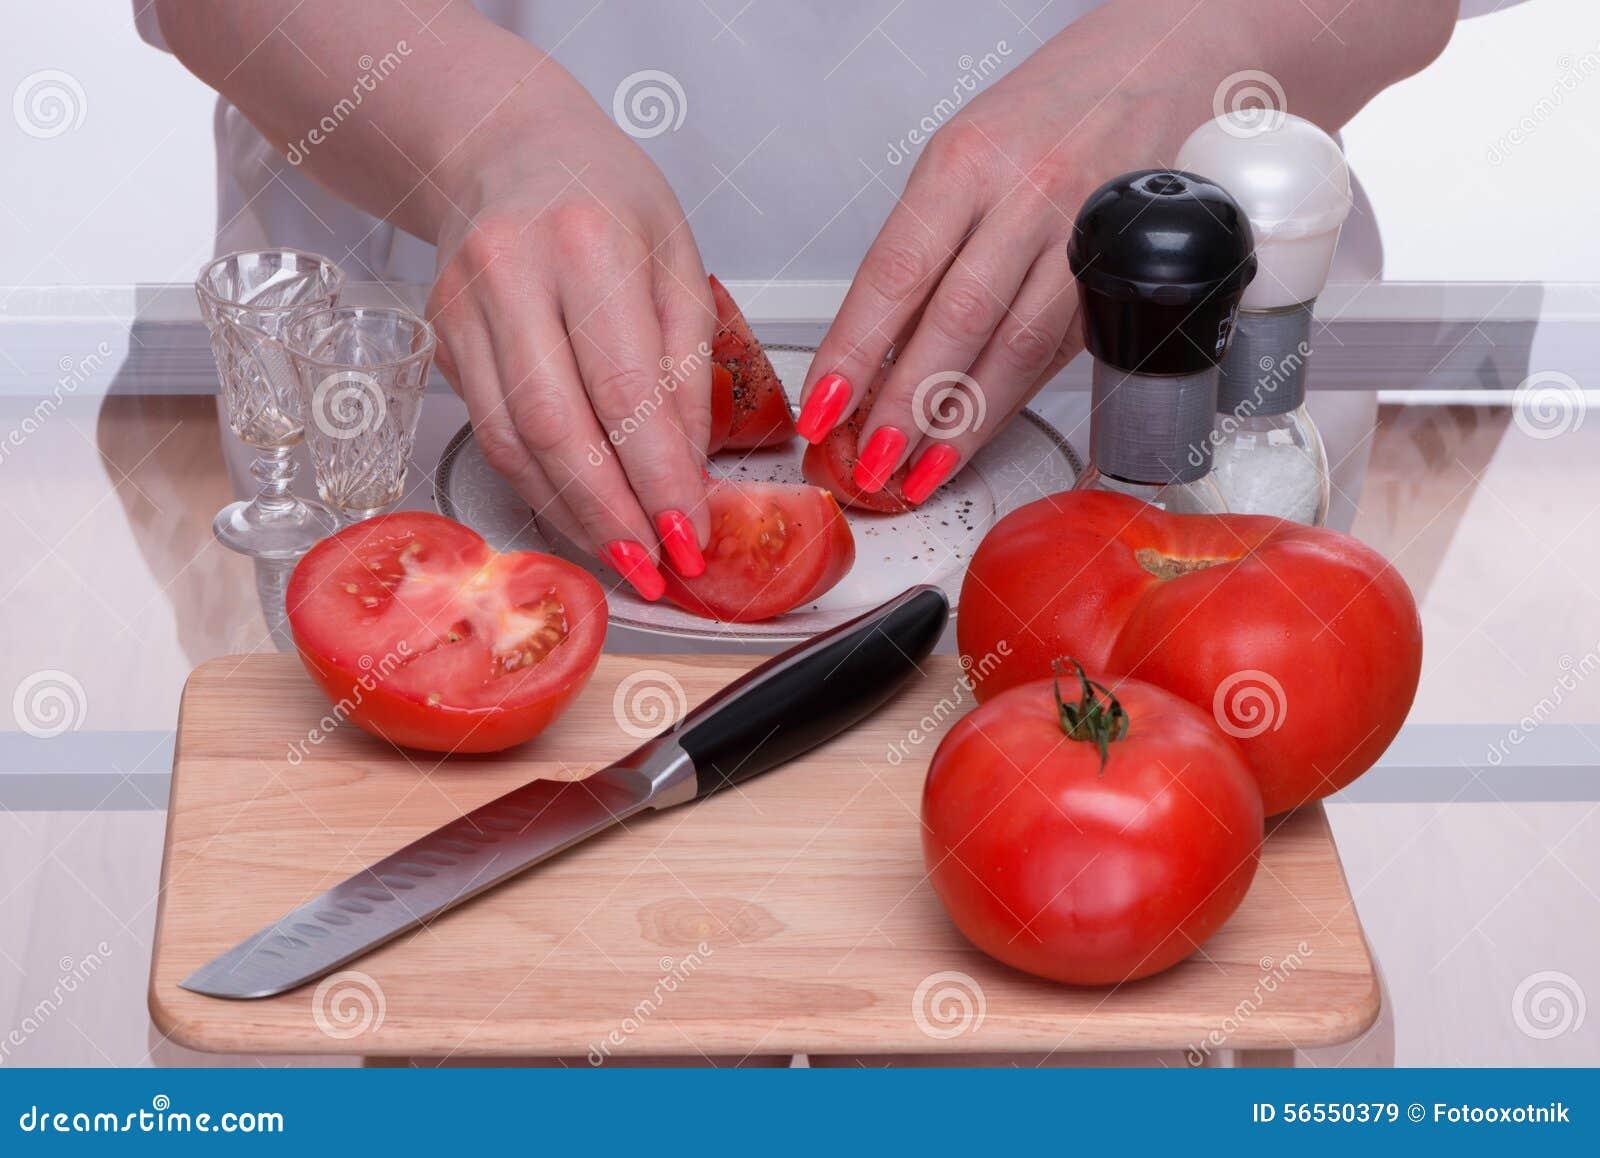 Download Ντομάτες και μαχαίρι σε έναν τεμαχίζοντας πίνακα Στοκ Εικόνα - εικόνα από γαστρονομικός, μαγείρεμα: 56550379